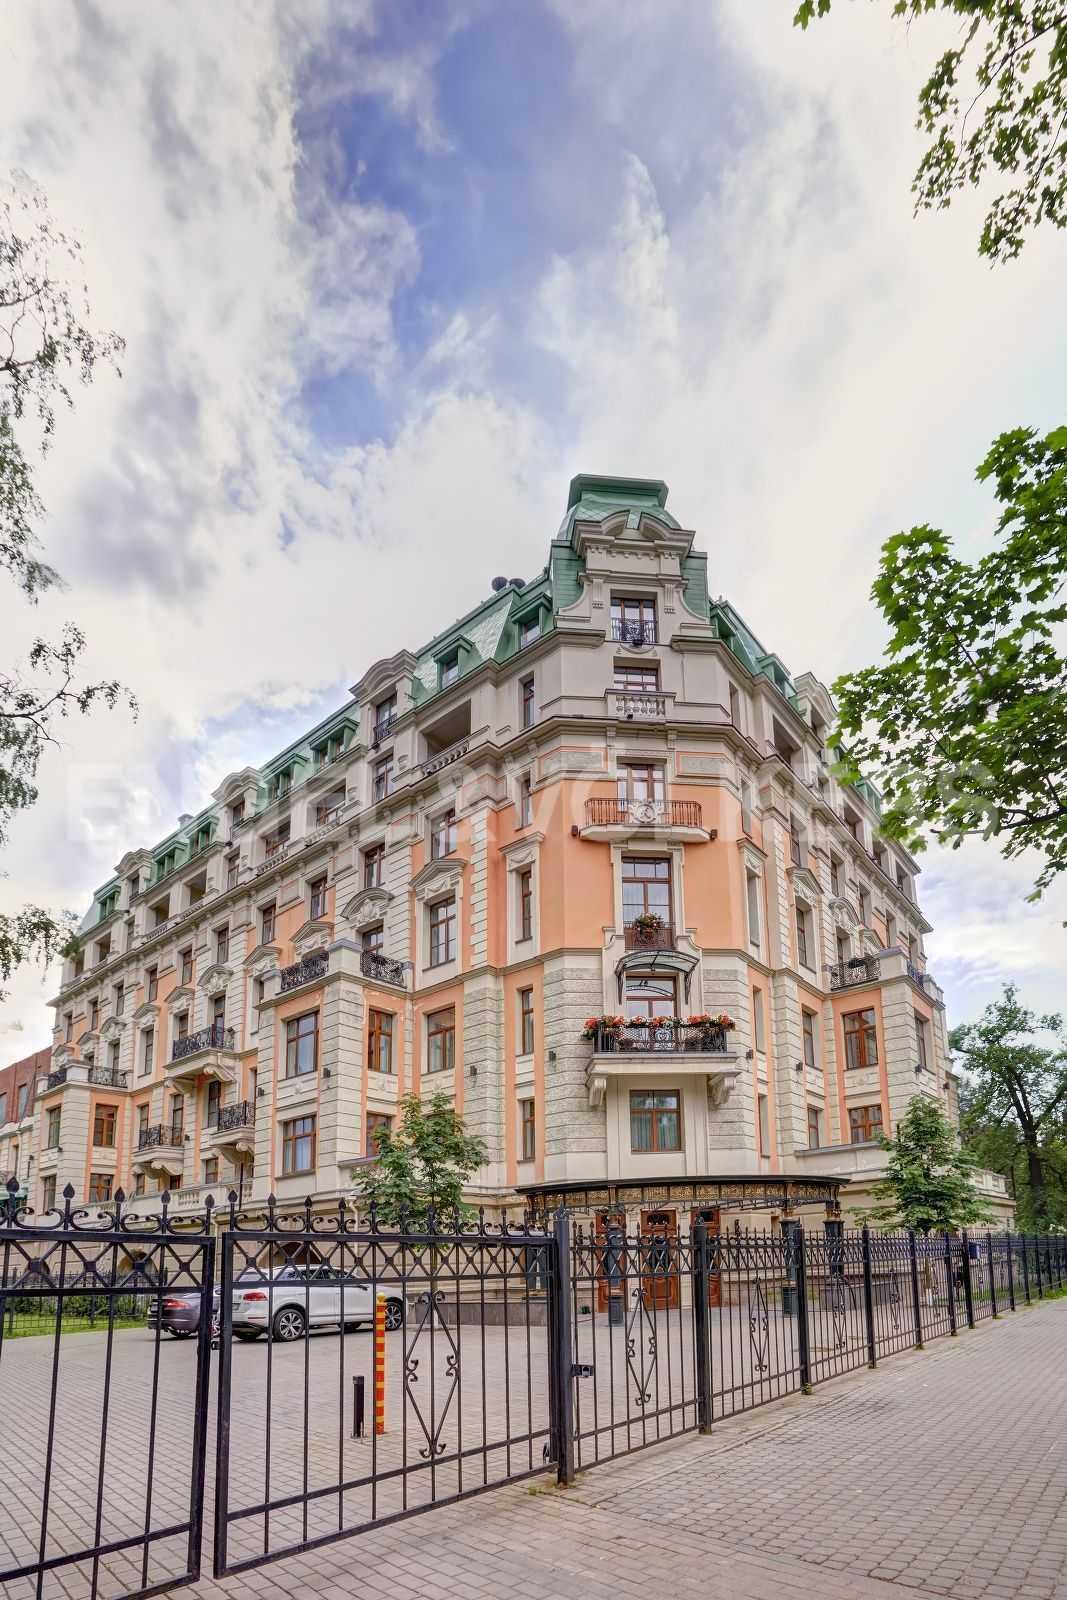 Элитные квартиры на . Санкт-Петербург, Динамо,12. Фасад дома